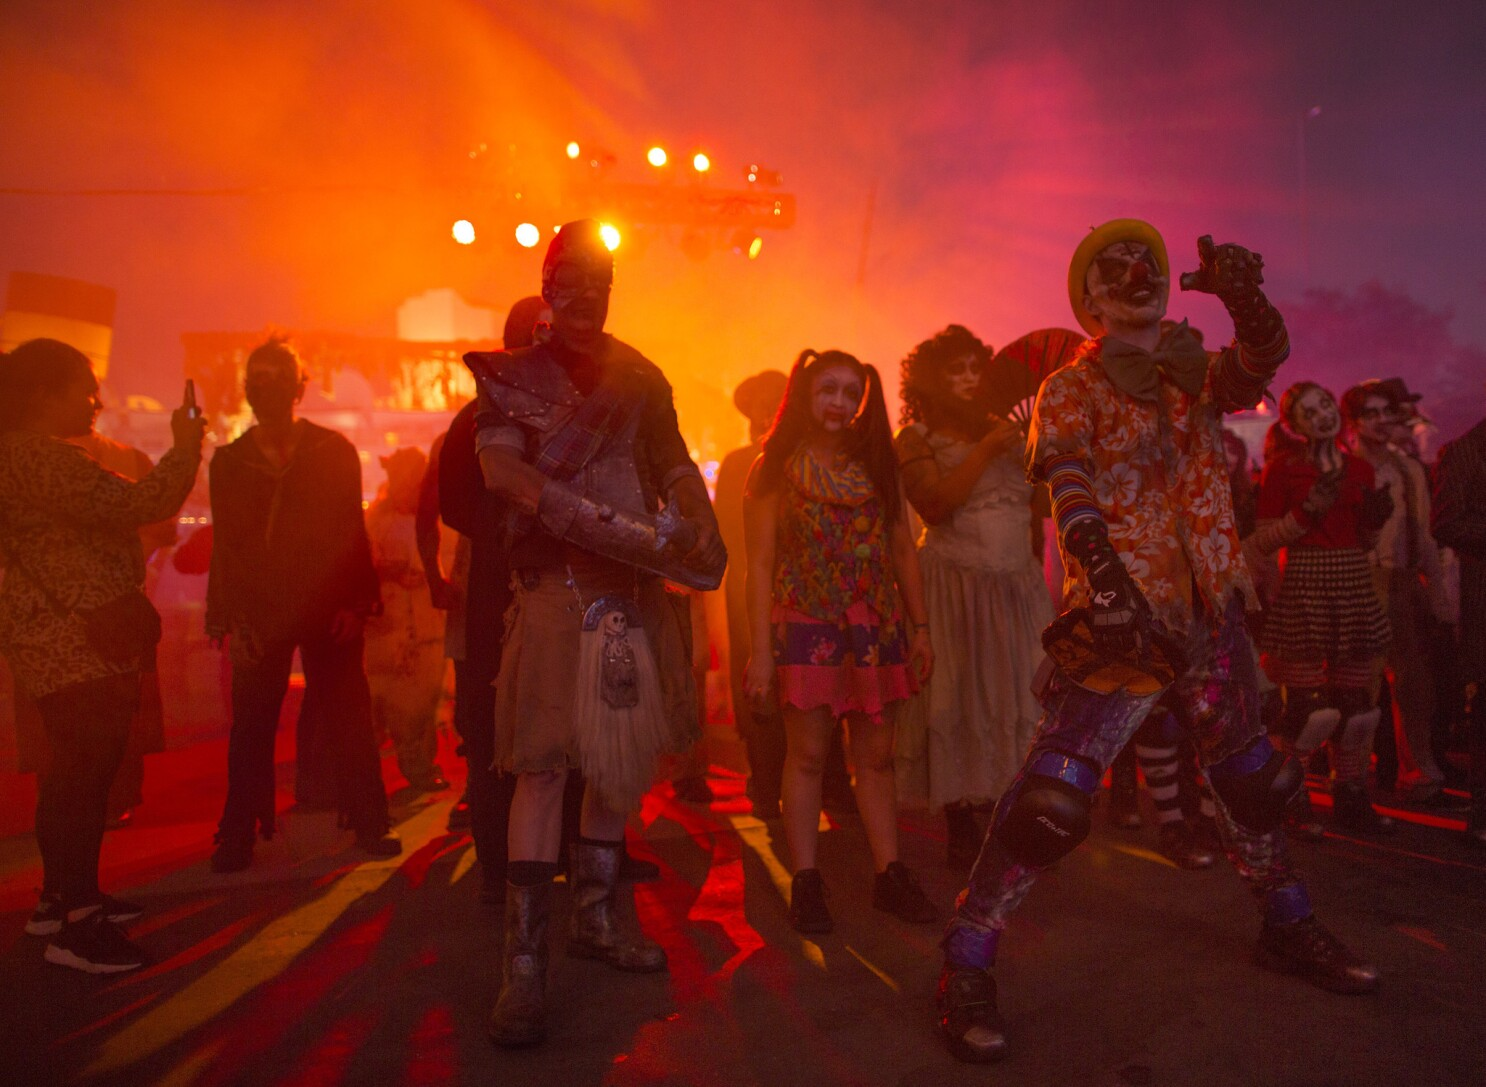 Halloween Queen Mary 2020 Corona fears spook Queen Mary into cancelling Dark Harbor haunt